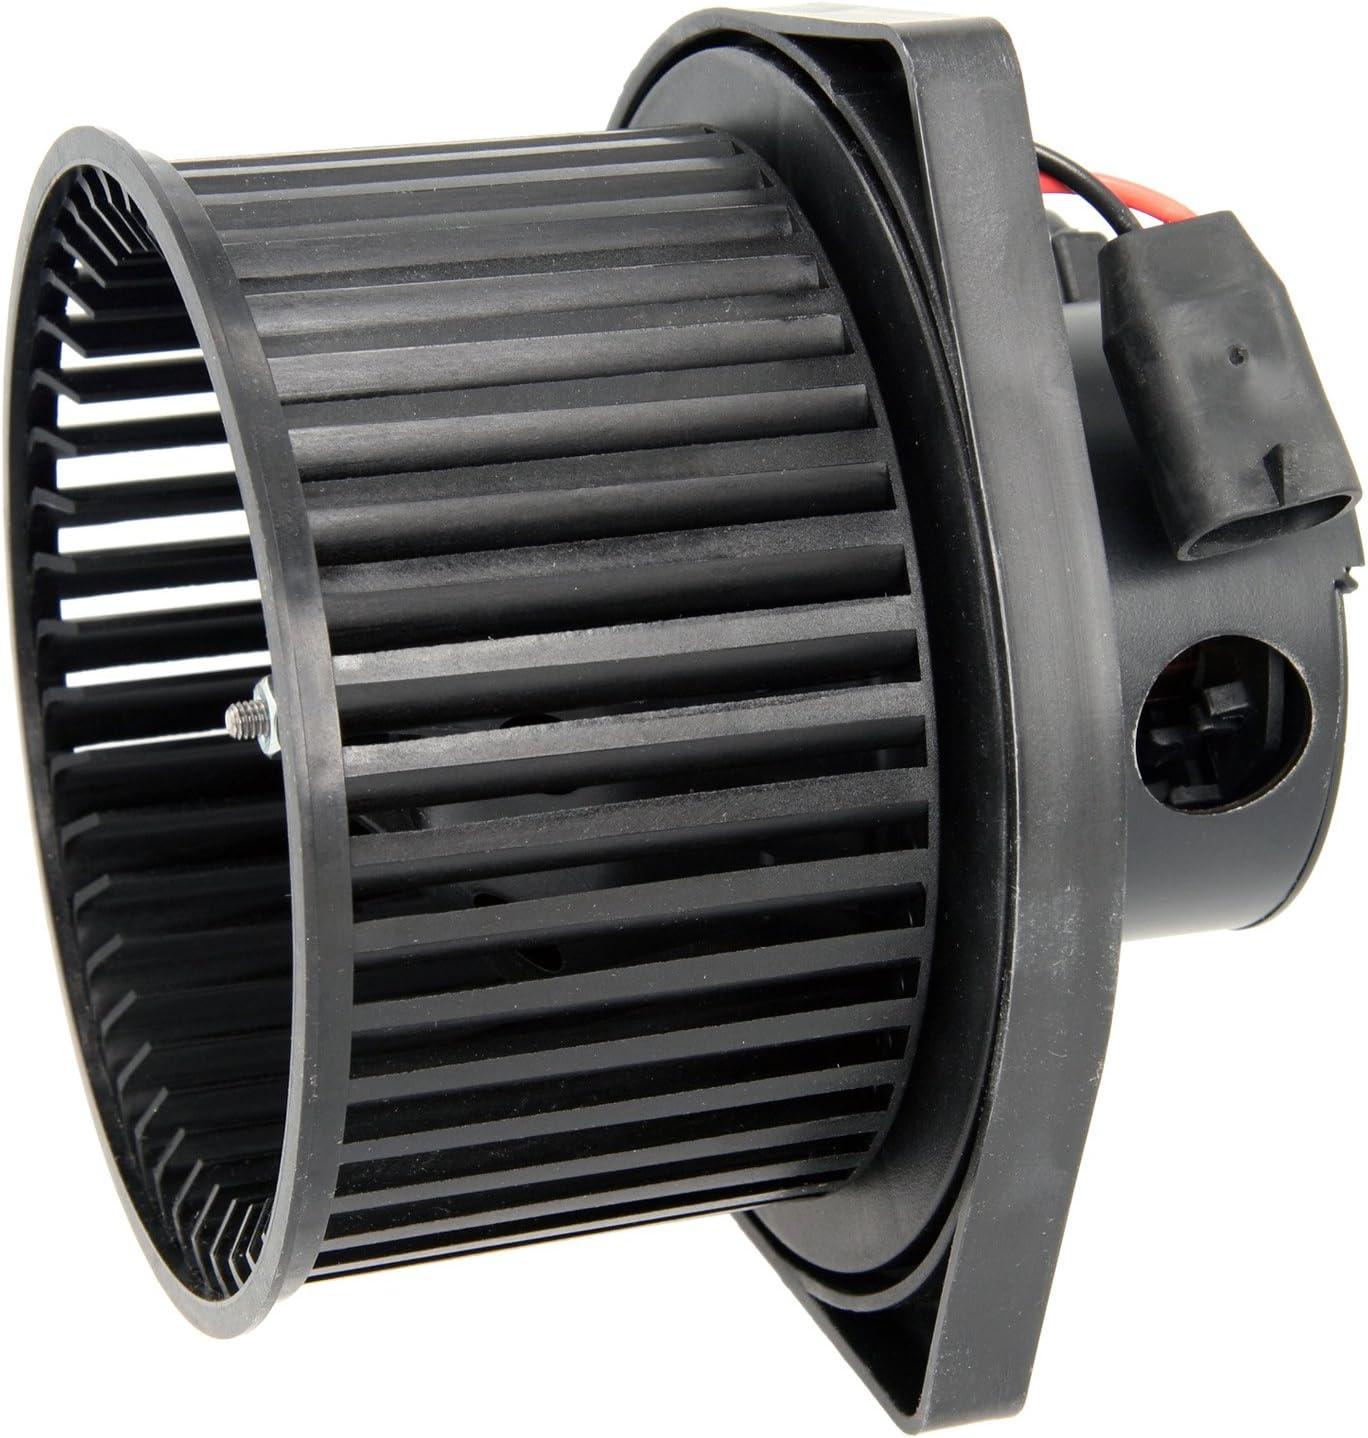 Four Seasons//Trumark 35084 Blower Motor with Wheel